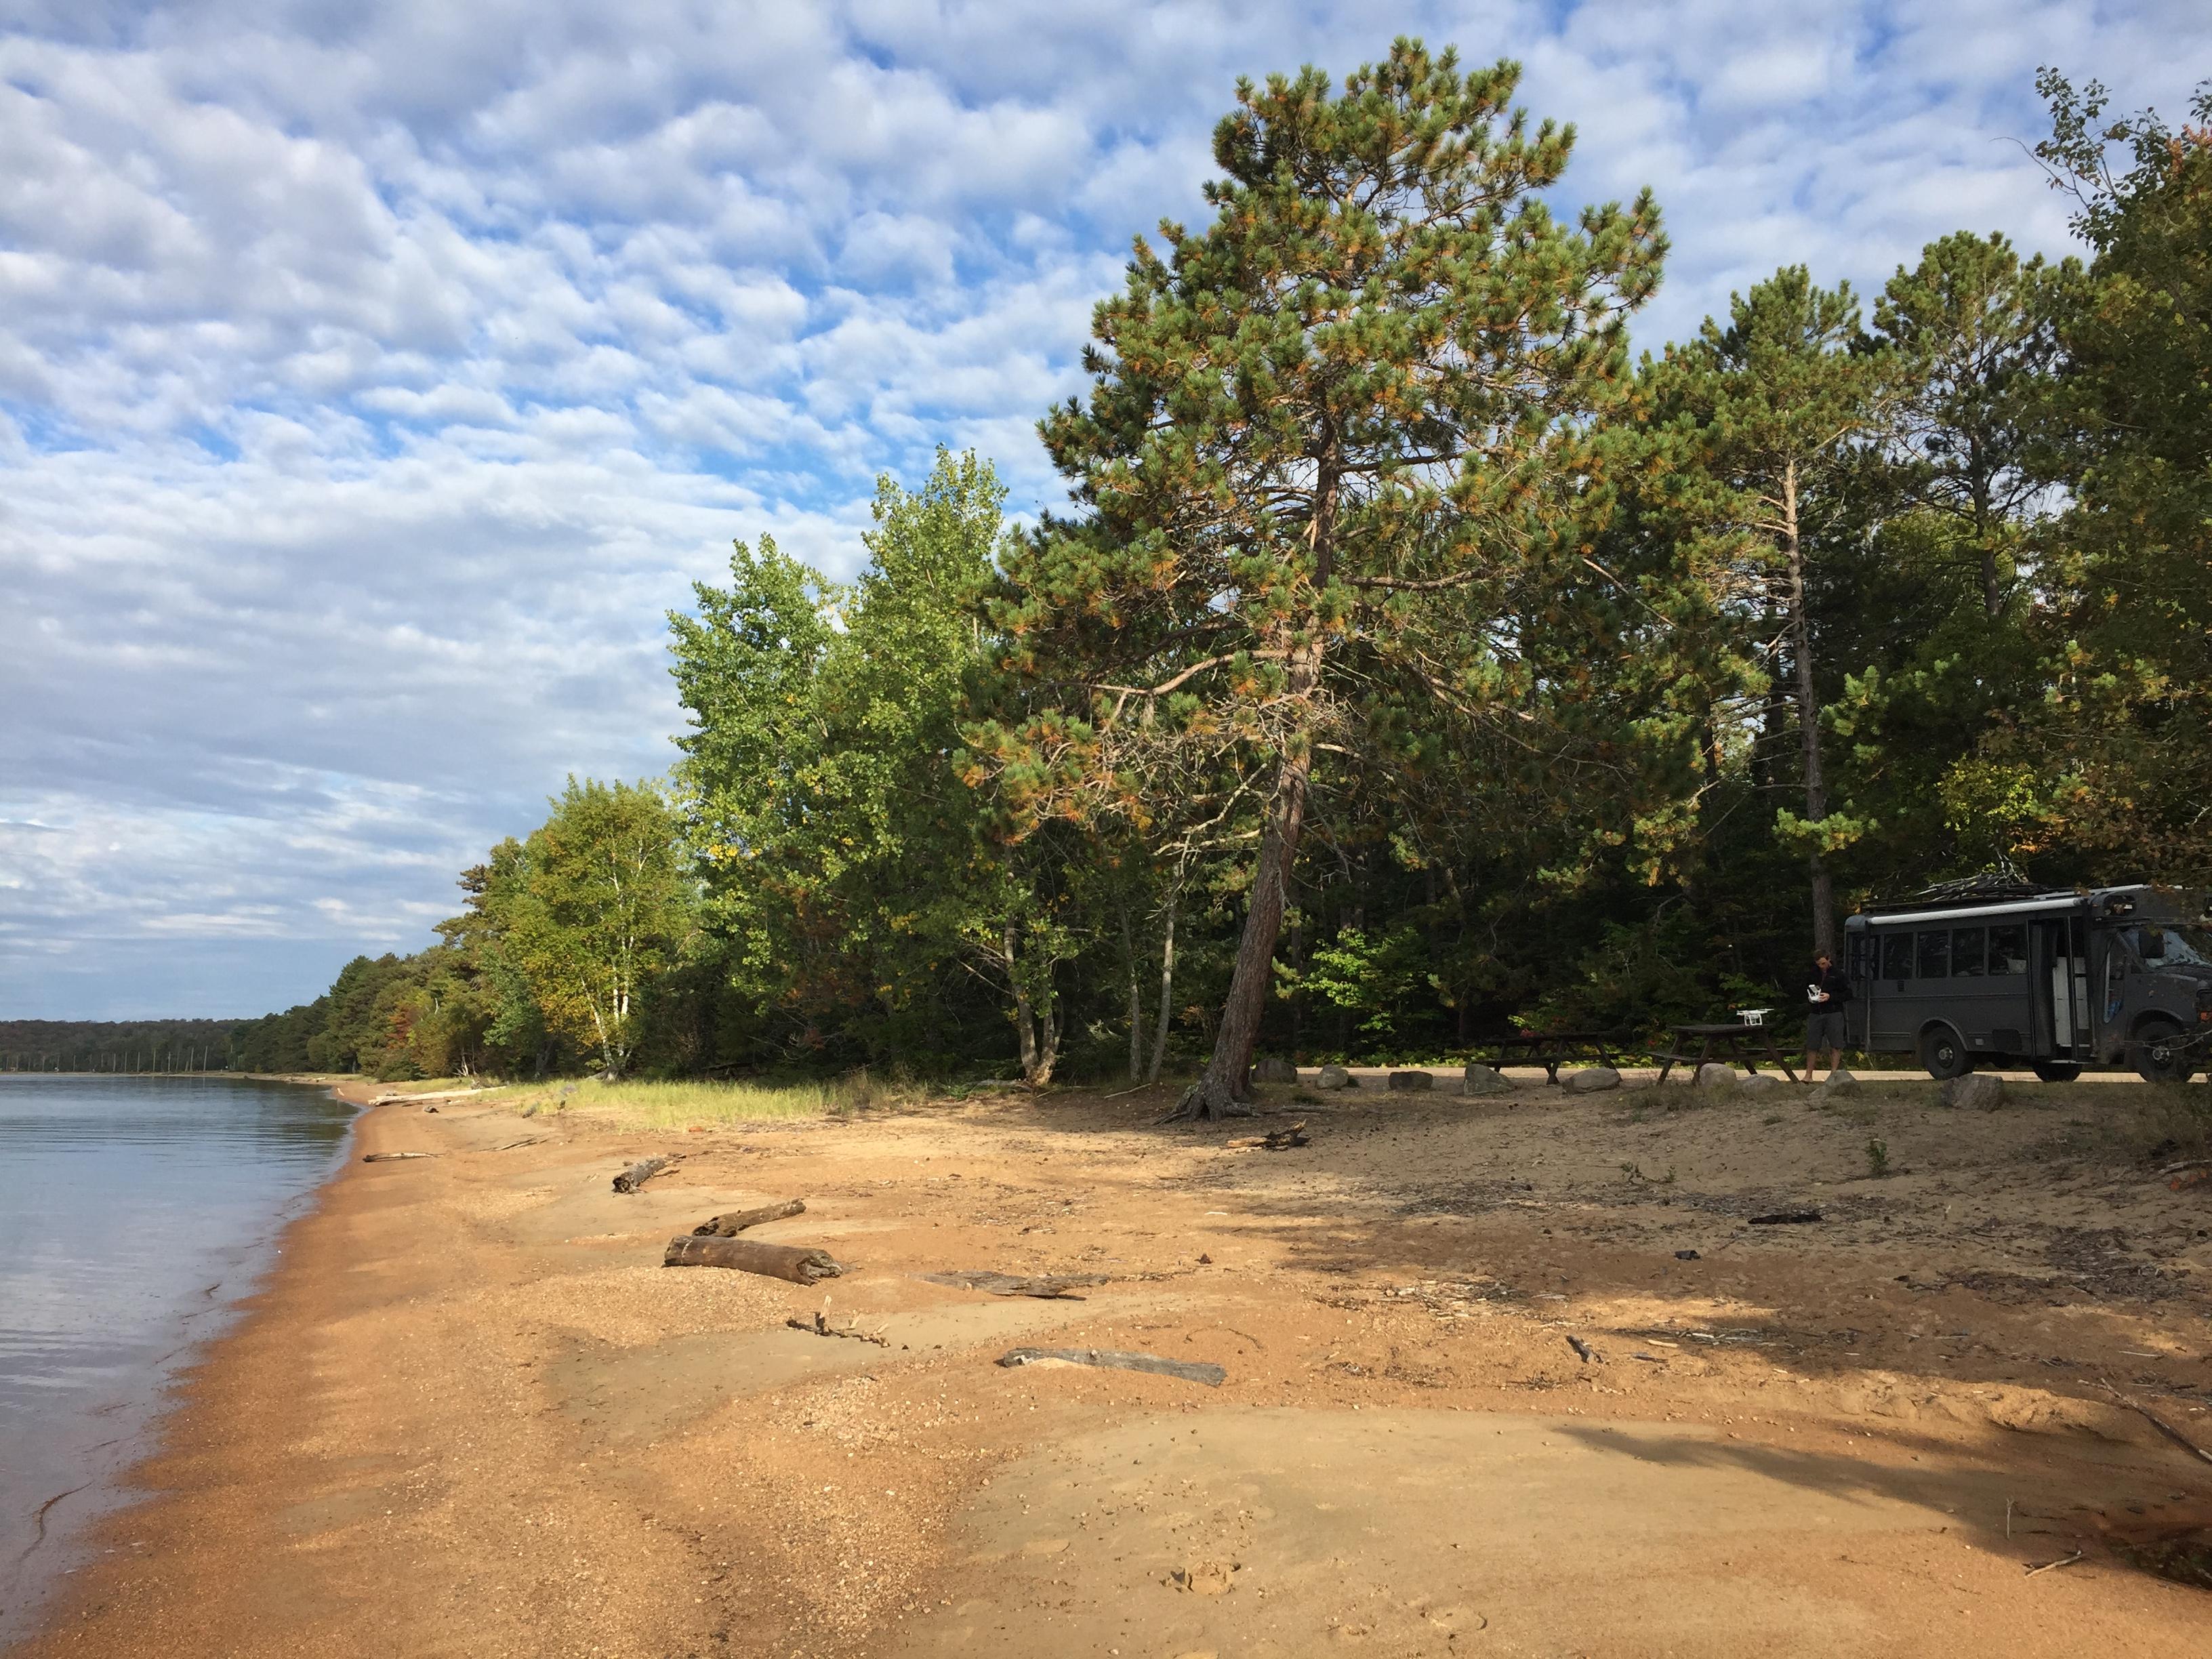 îles Manitoulin voyage road trip paysage Ontario